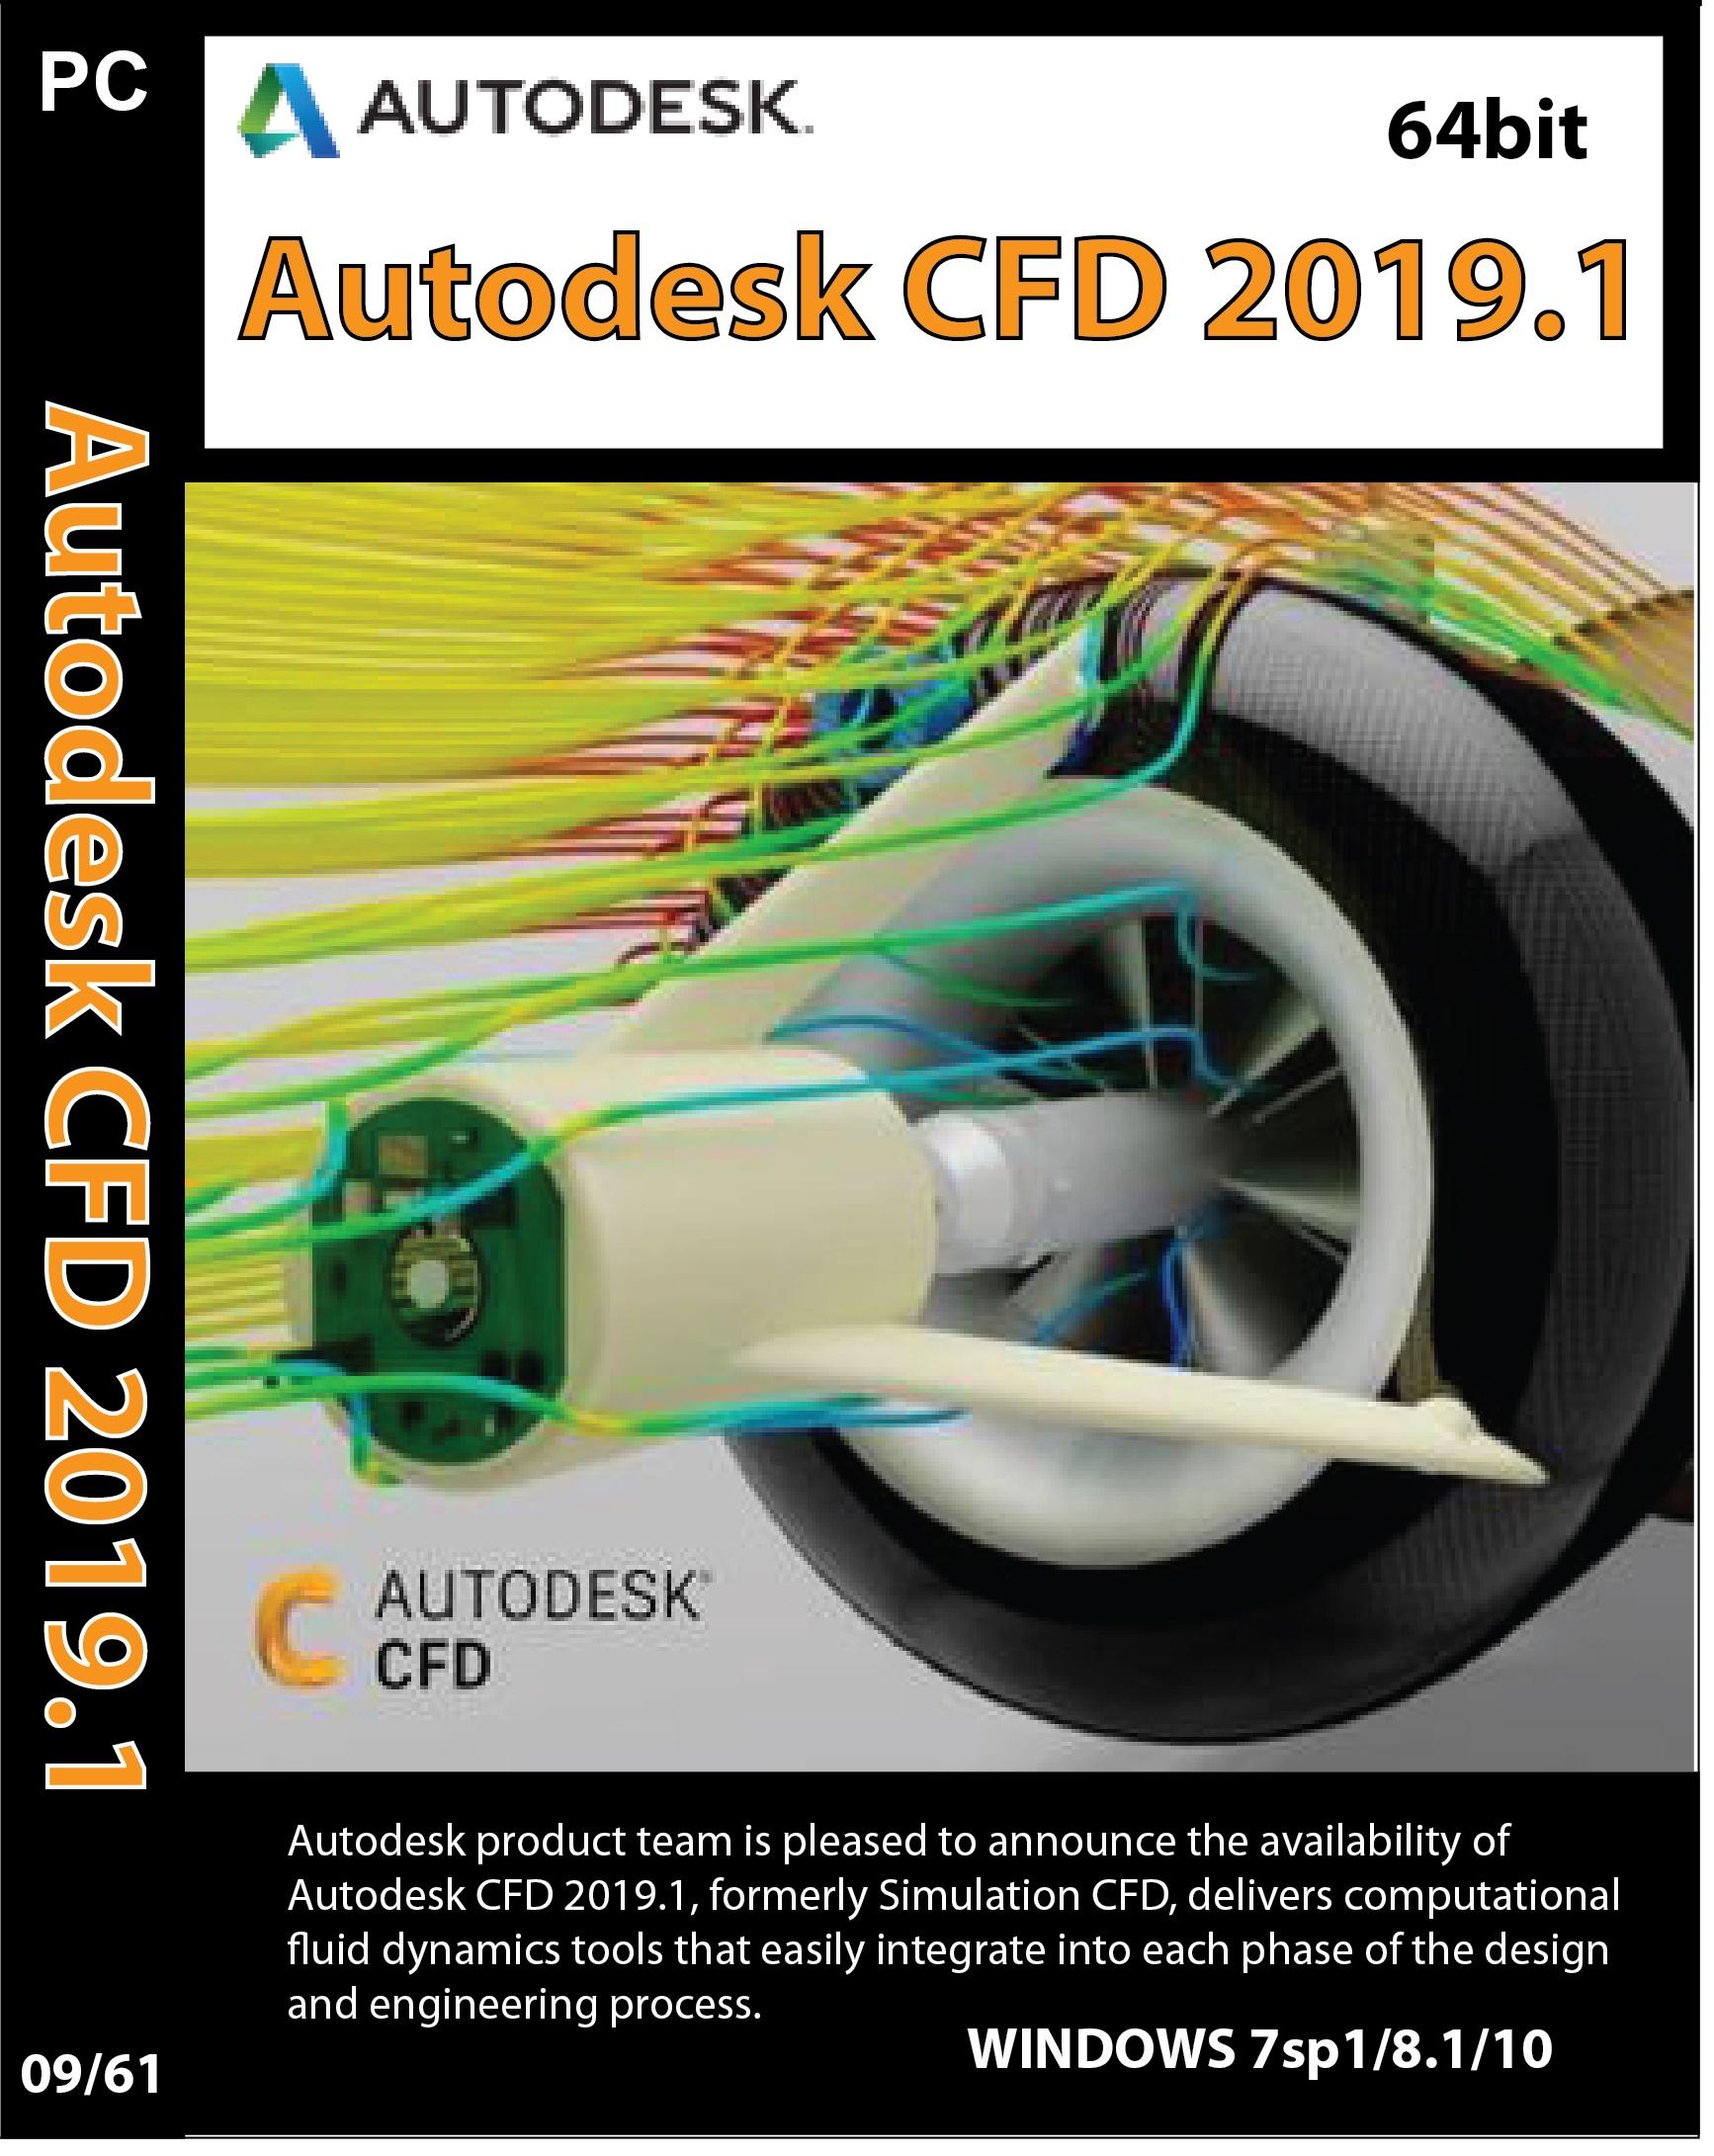 Autodesk CFD 2019-01